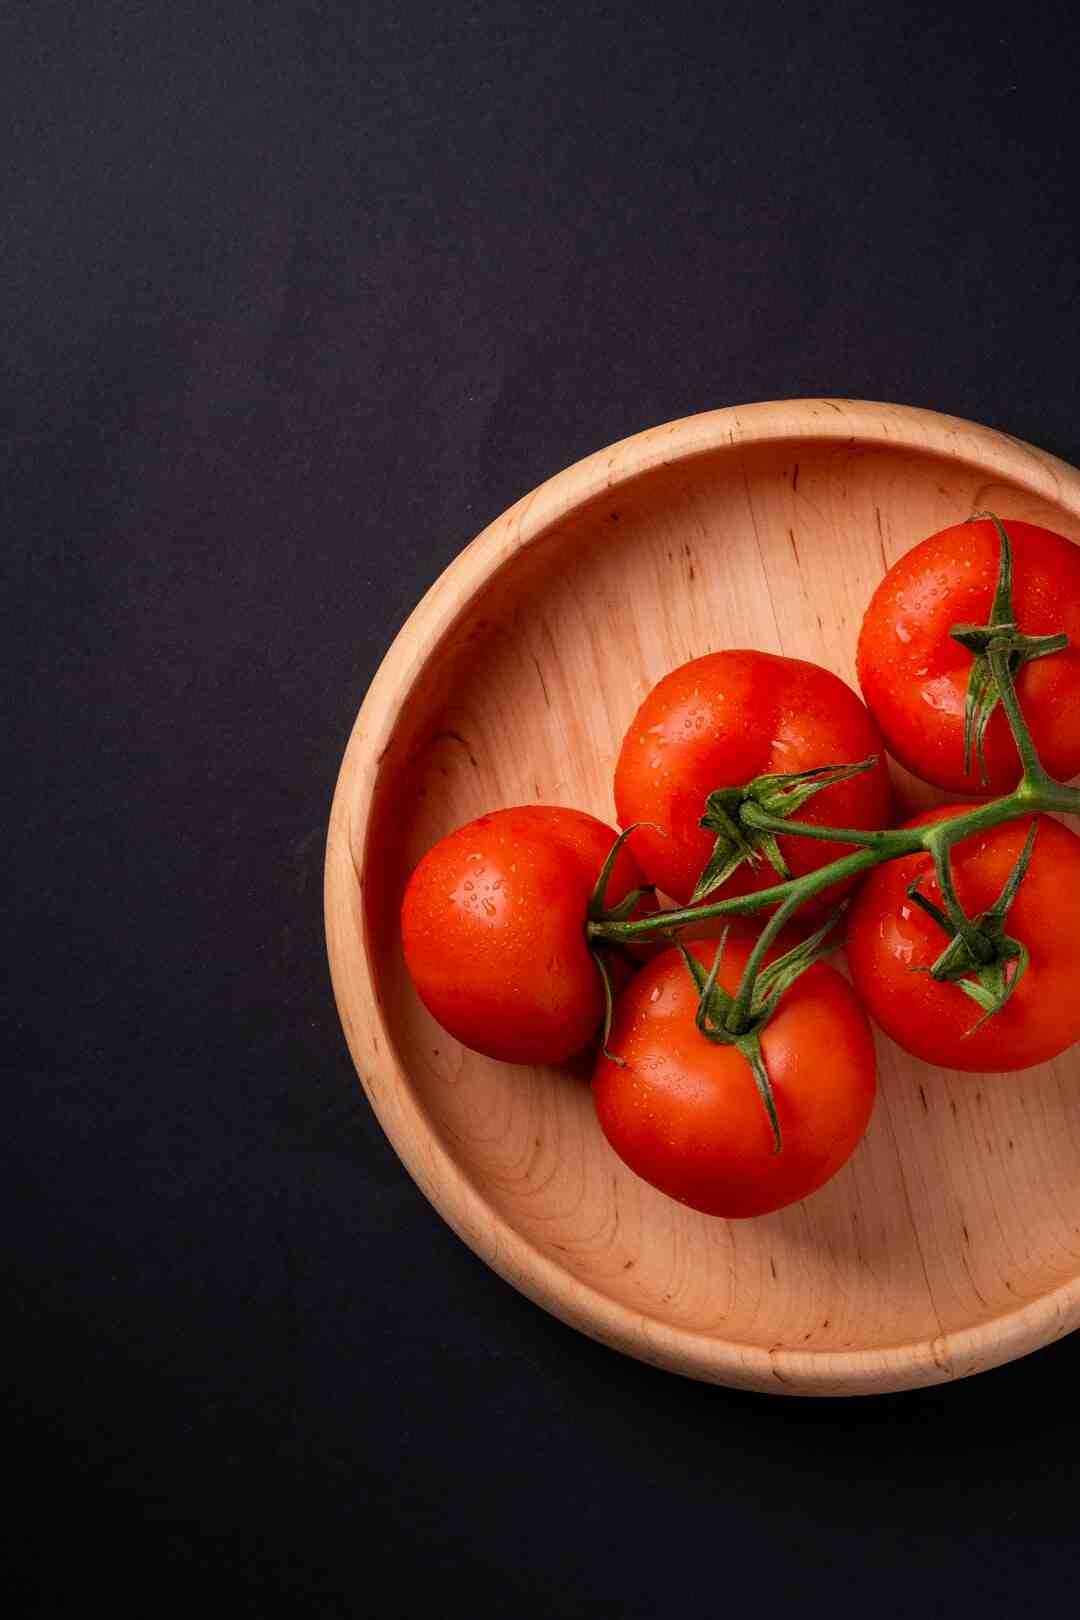 Quand fleurissent les tomates ?